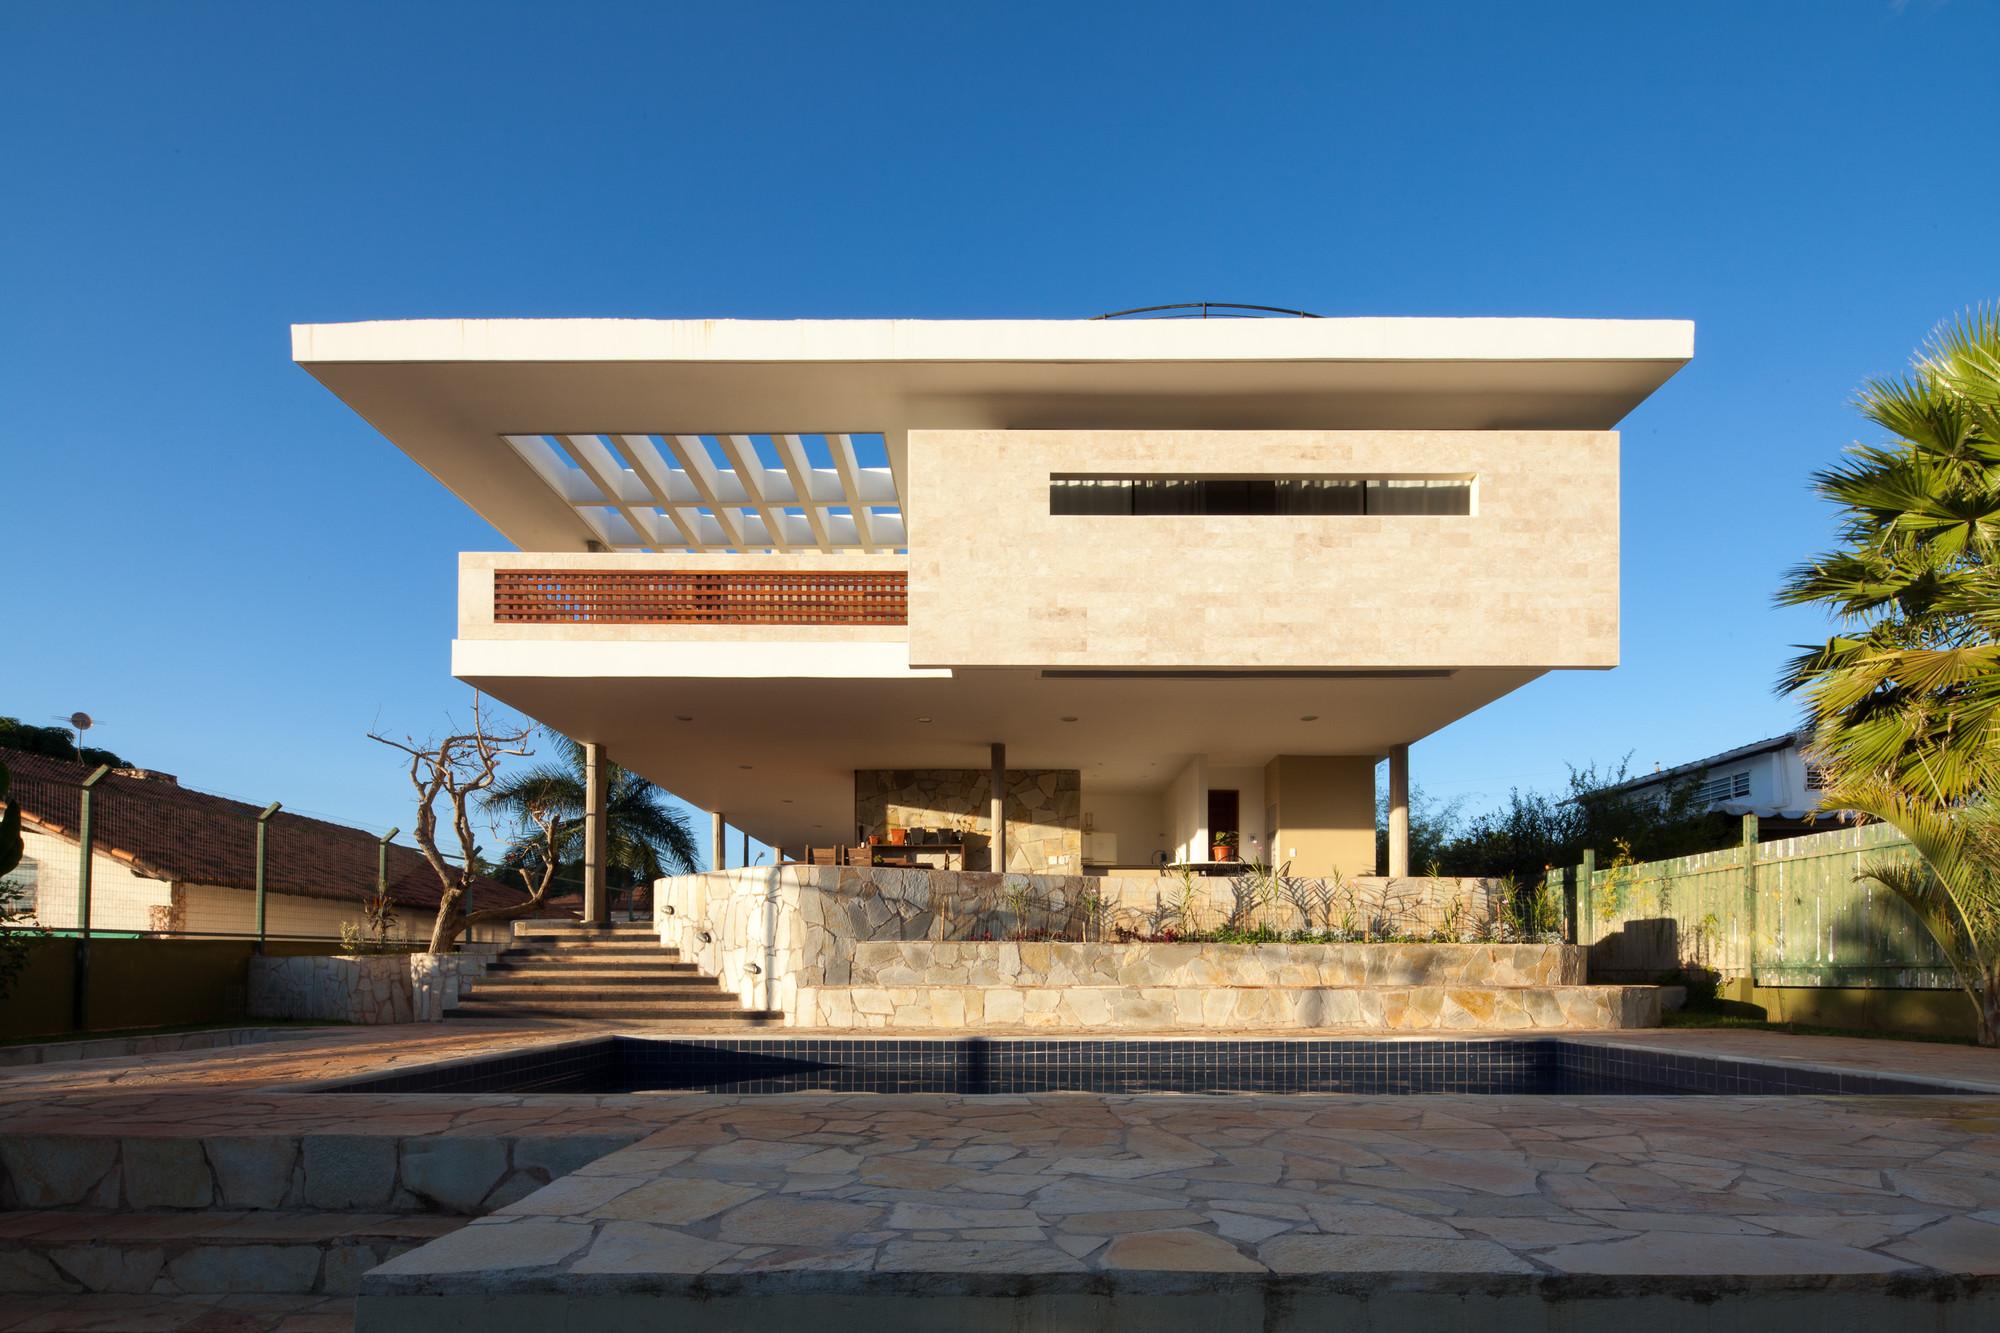 JPGN House / Macedo, Gomes & Sobreira, © Joana França